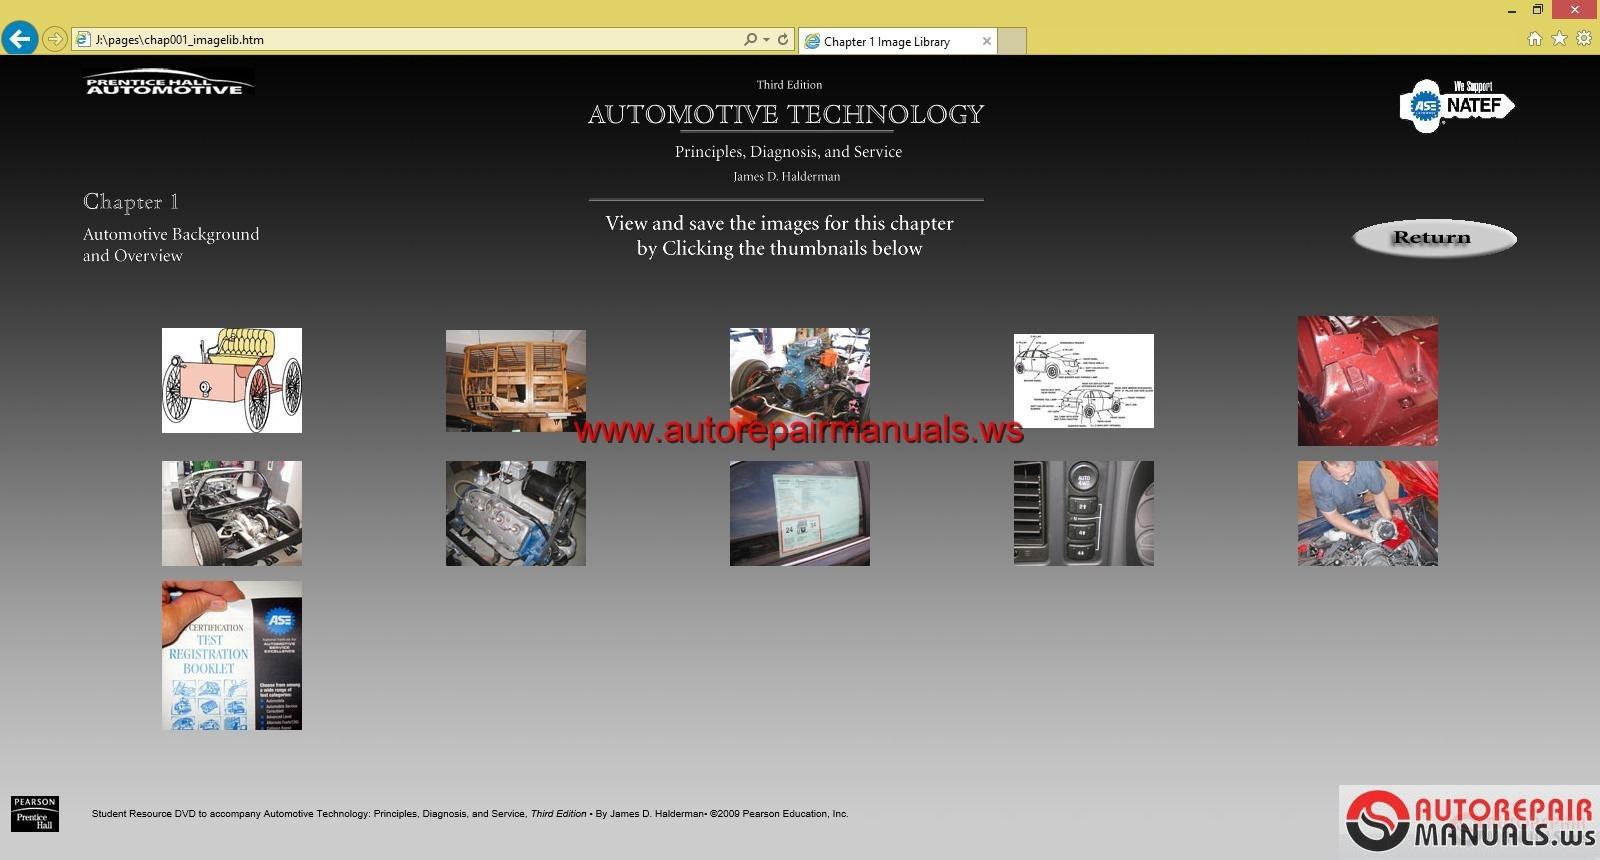 Automotive technology principles diagnosis and service